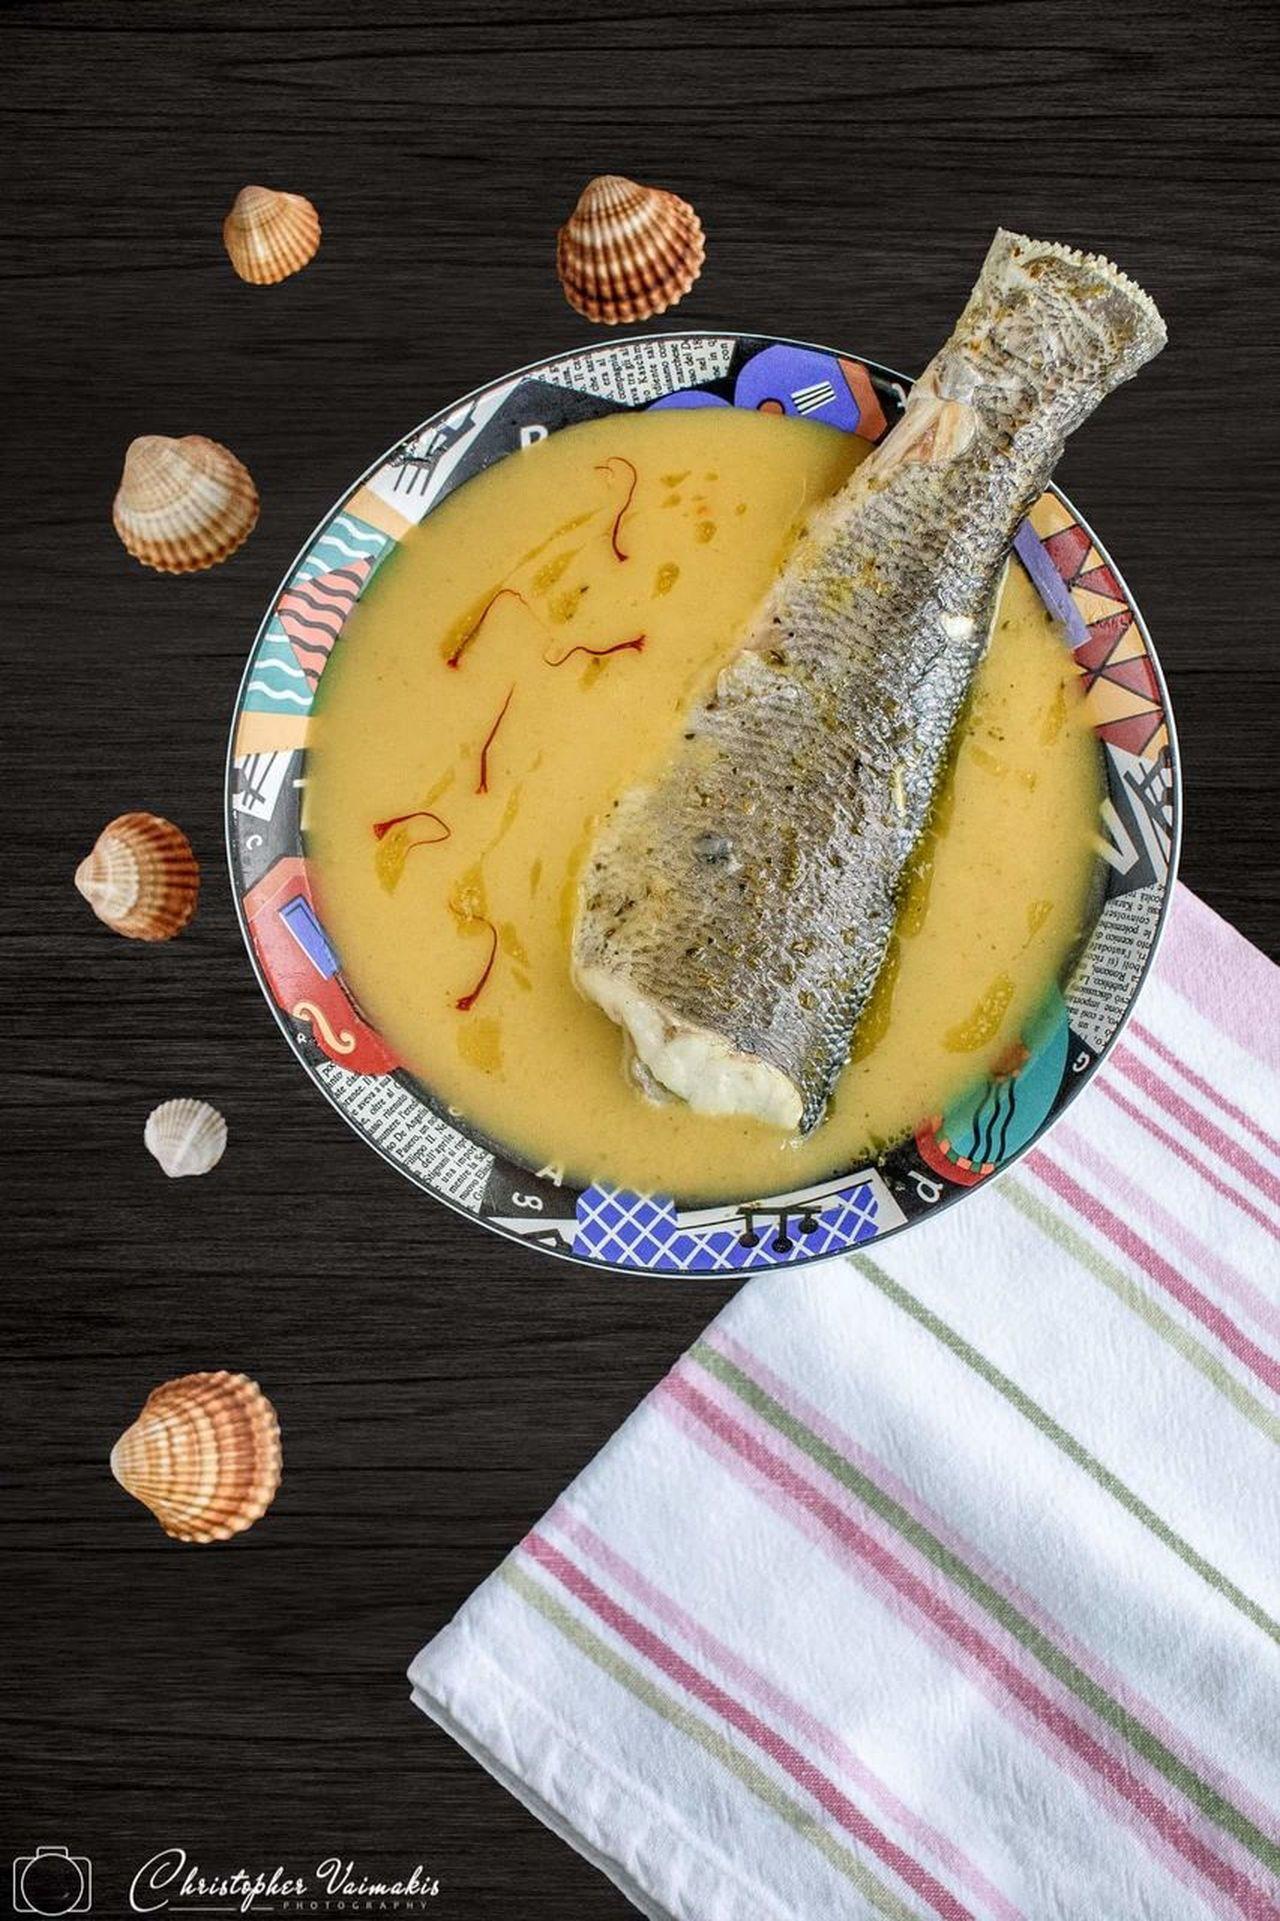 Fish Soup TastyFreshness Food Love Freshness Healthy Eating Healthy Tastyfood Art Sea Foodporn Sweet Food Summer Food And Drink Salt Foodlover